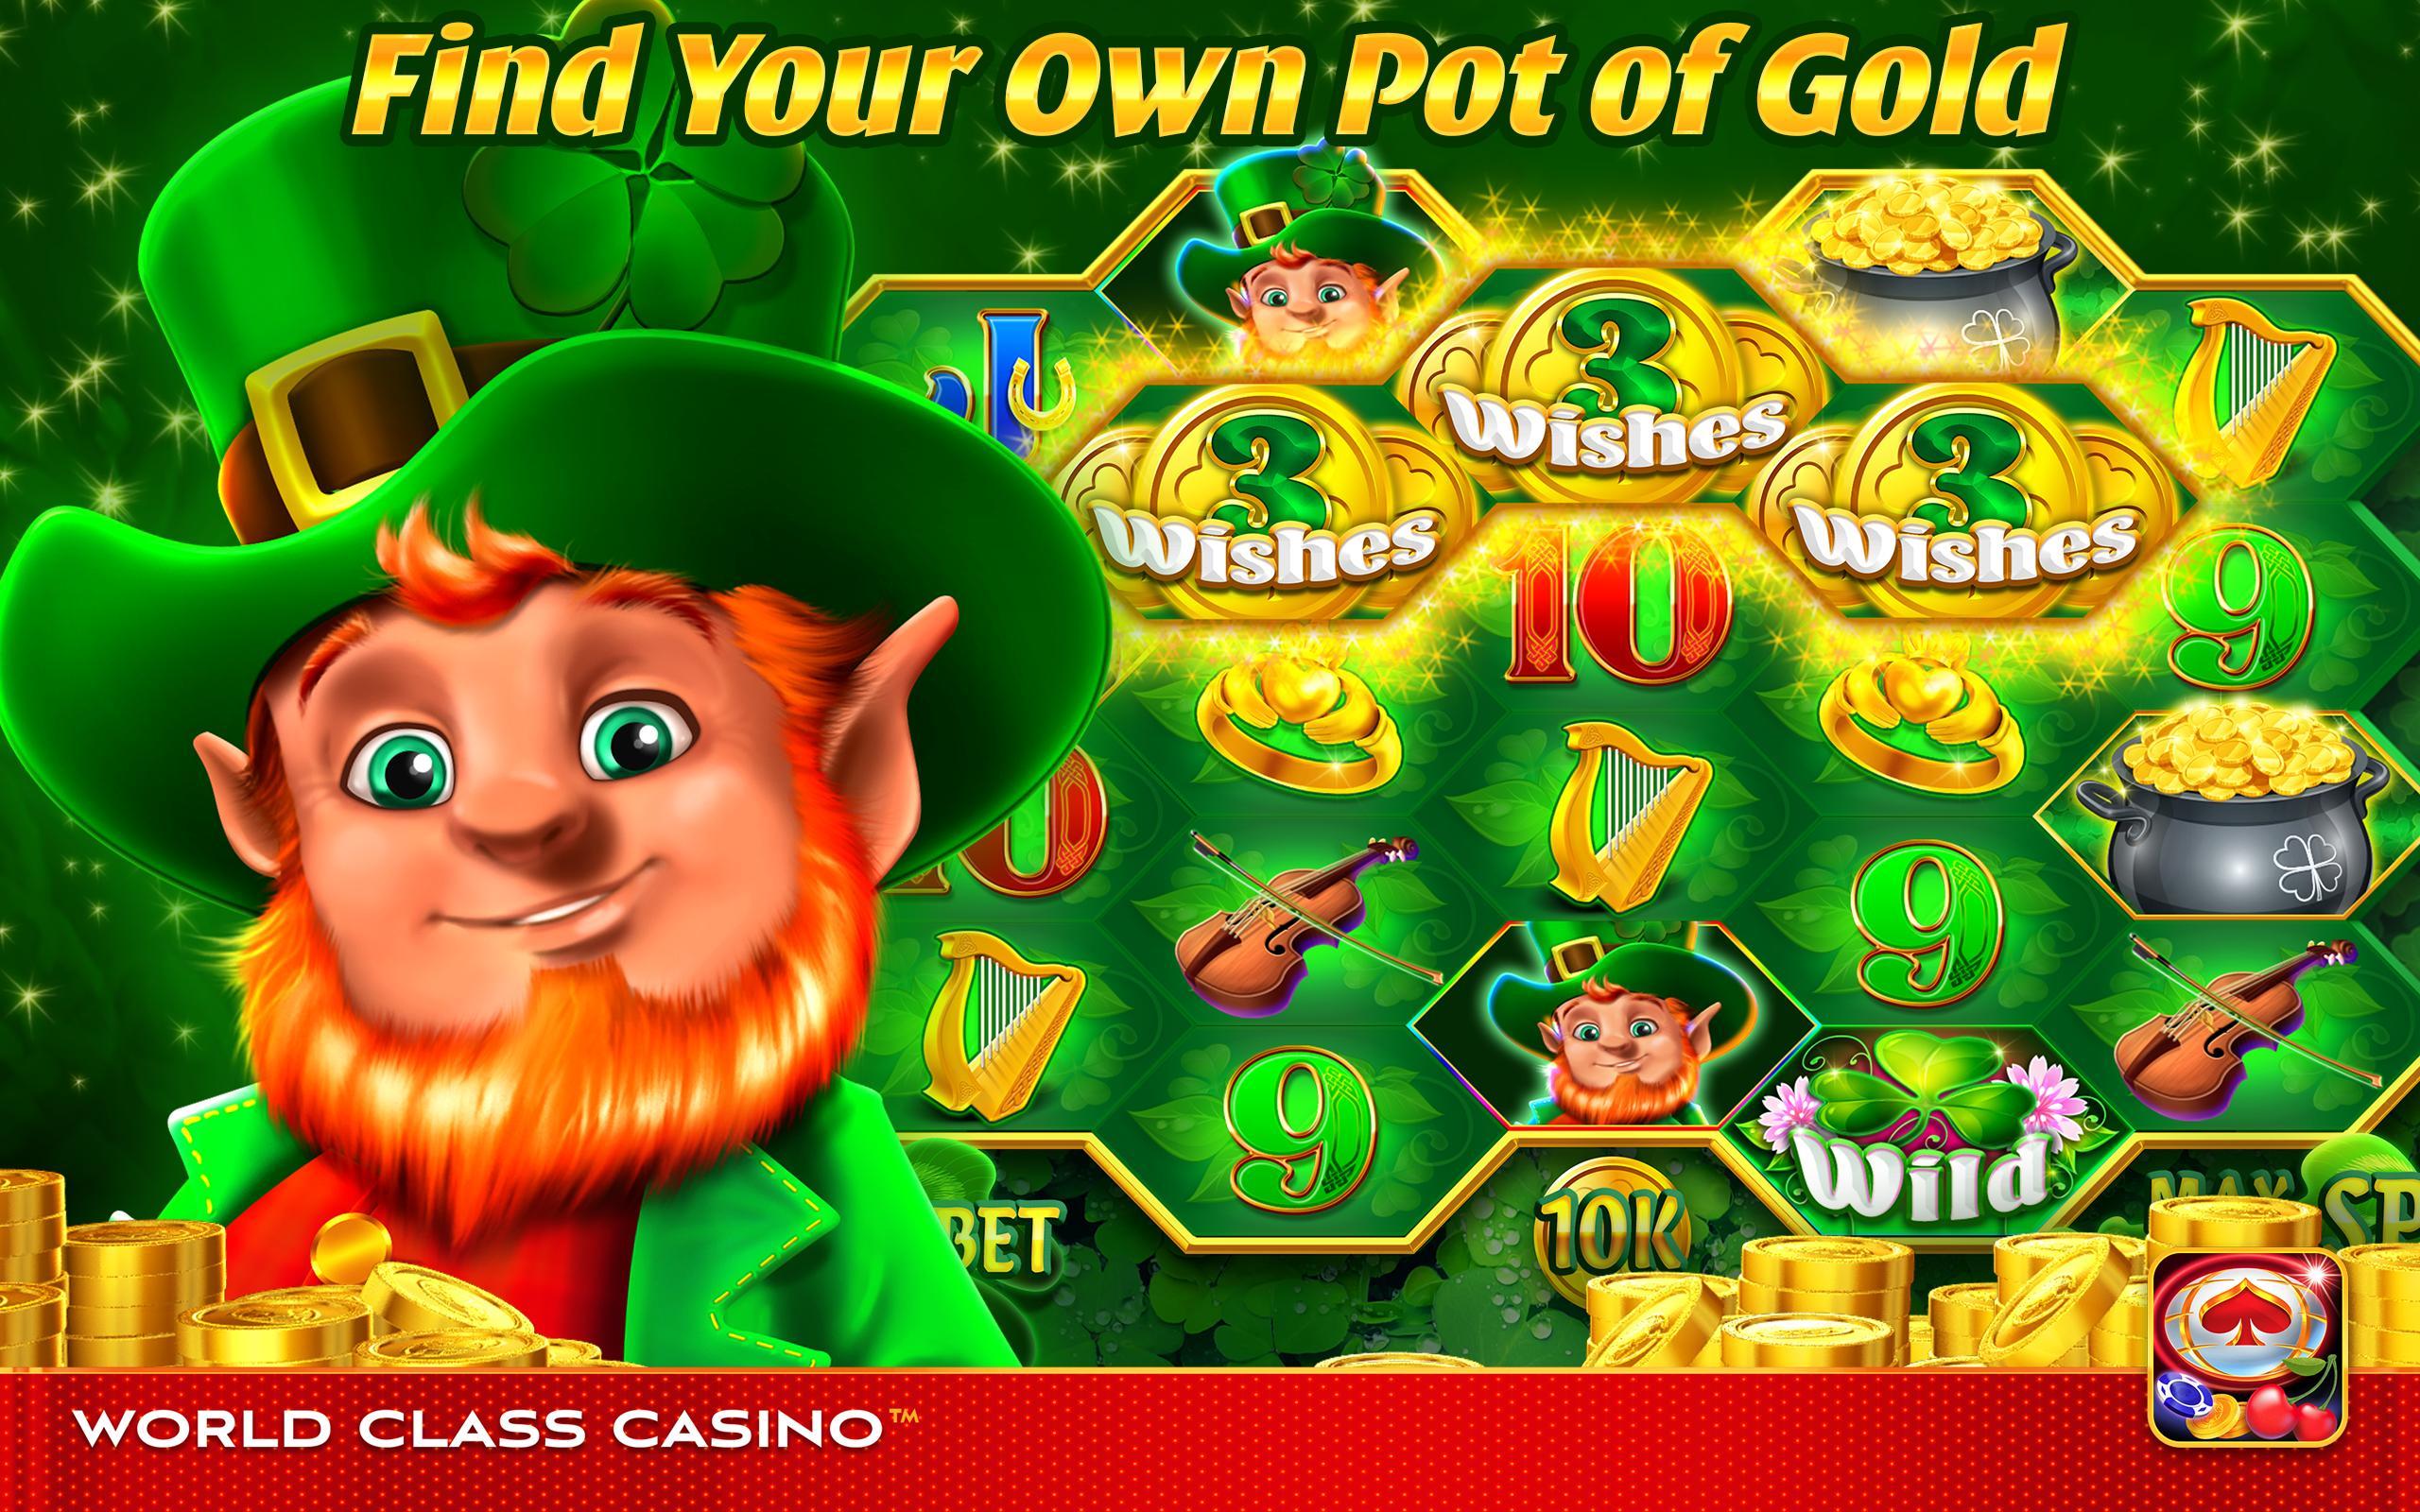 World Class Casino Slots, Blackjack & Poker Room 8.0.4 Screenshot 7